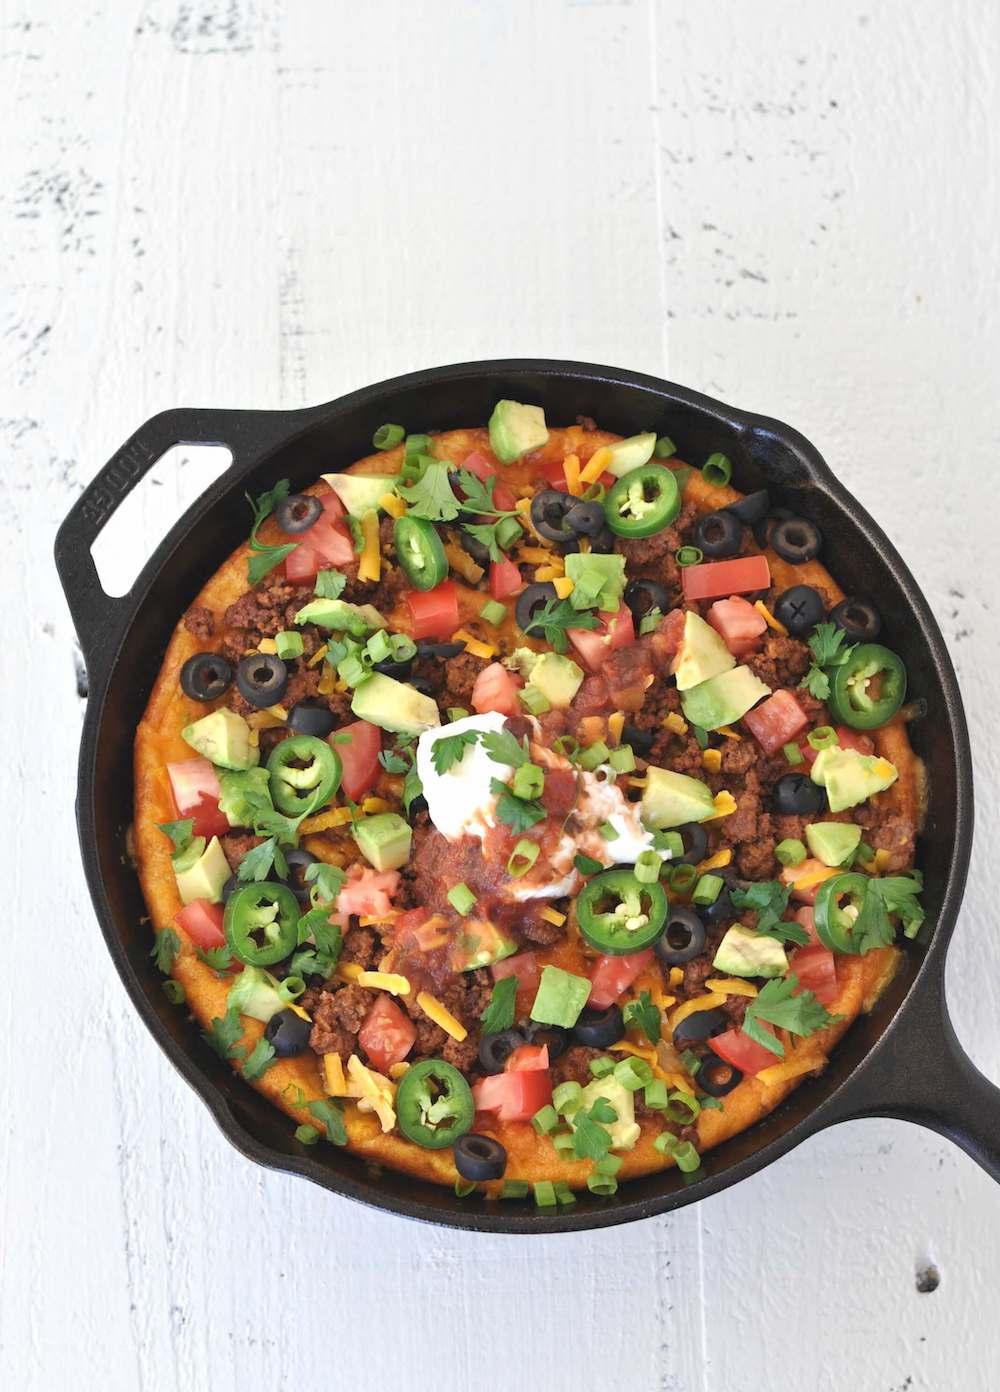 Keto Breakfast Recipes - Keto Taco Breakfast Skillet